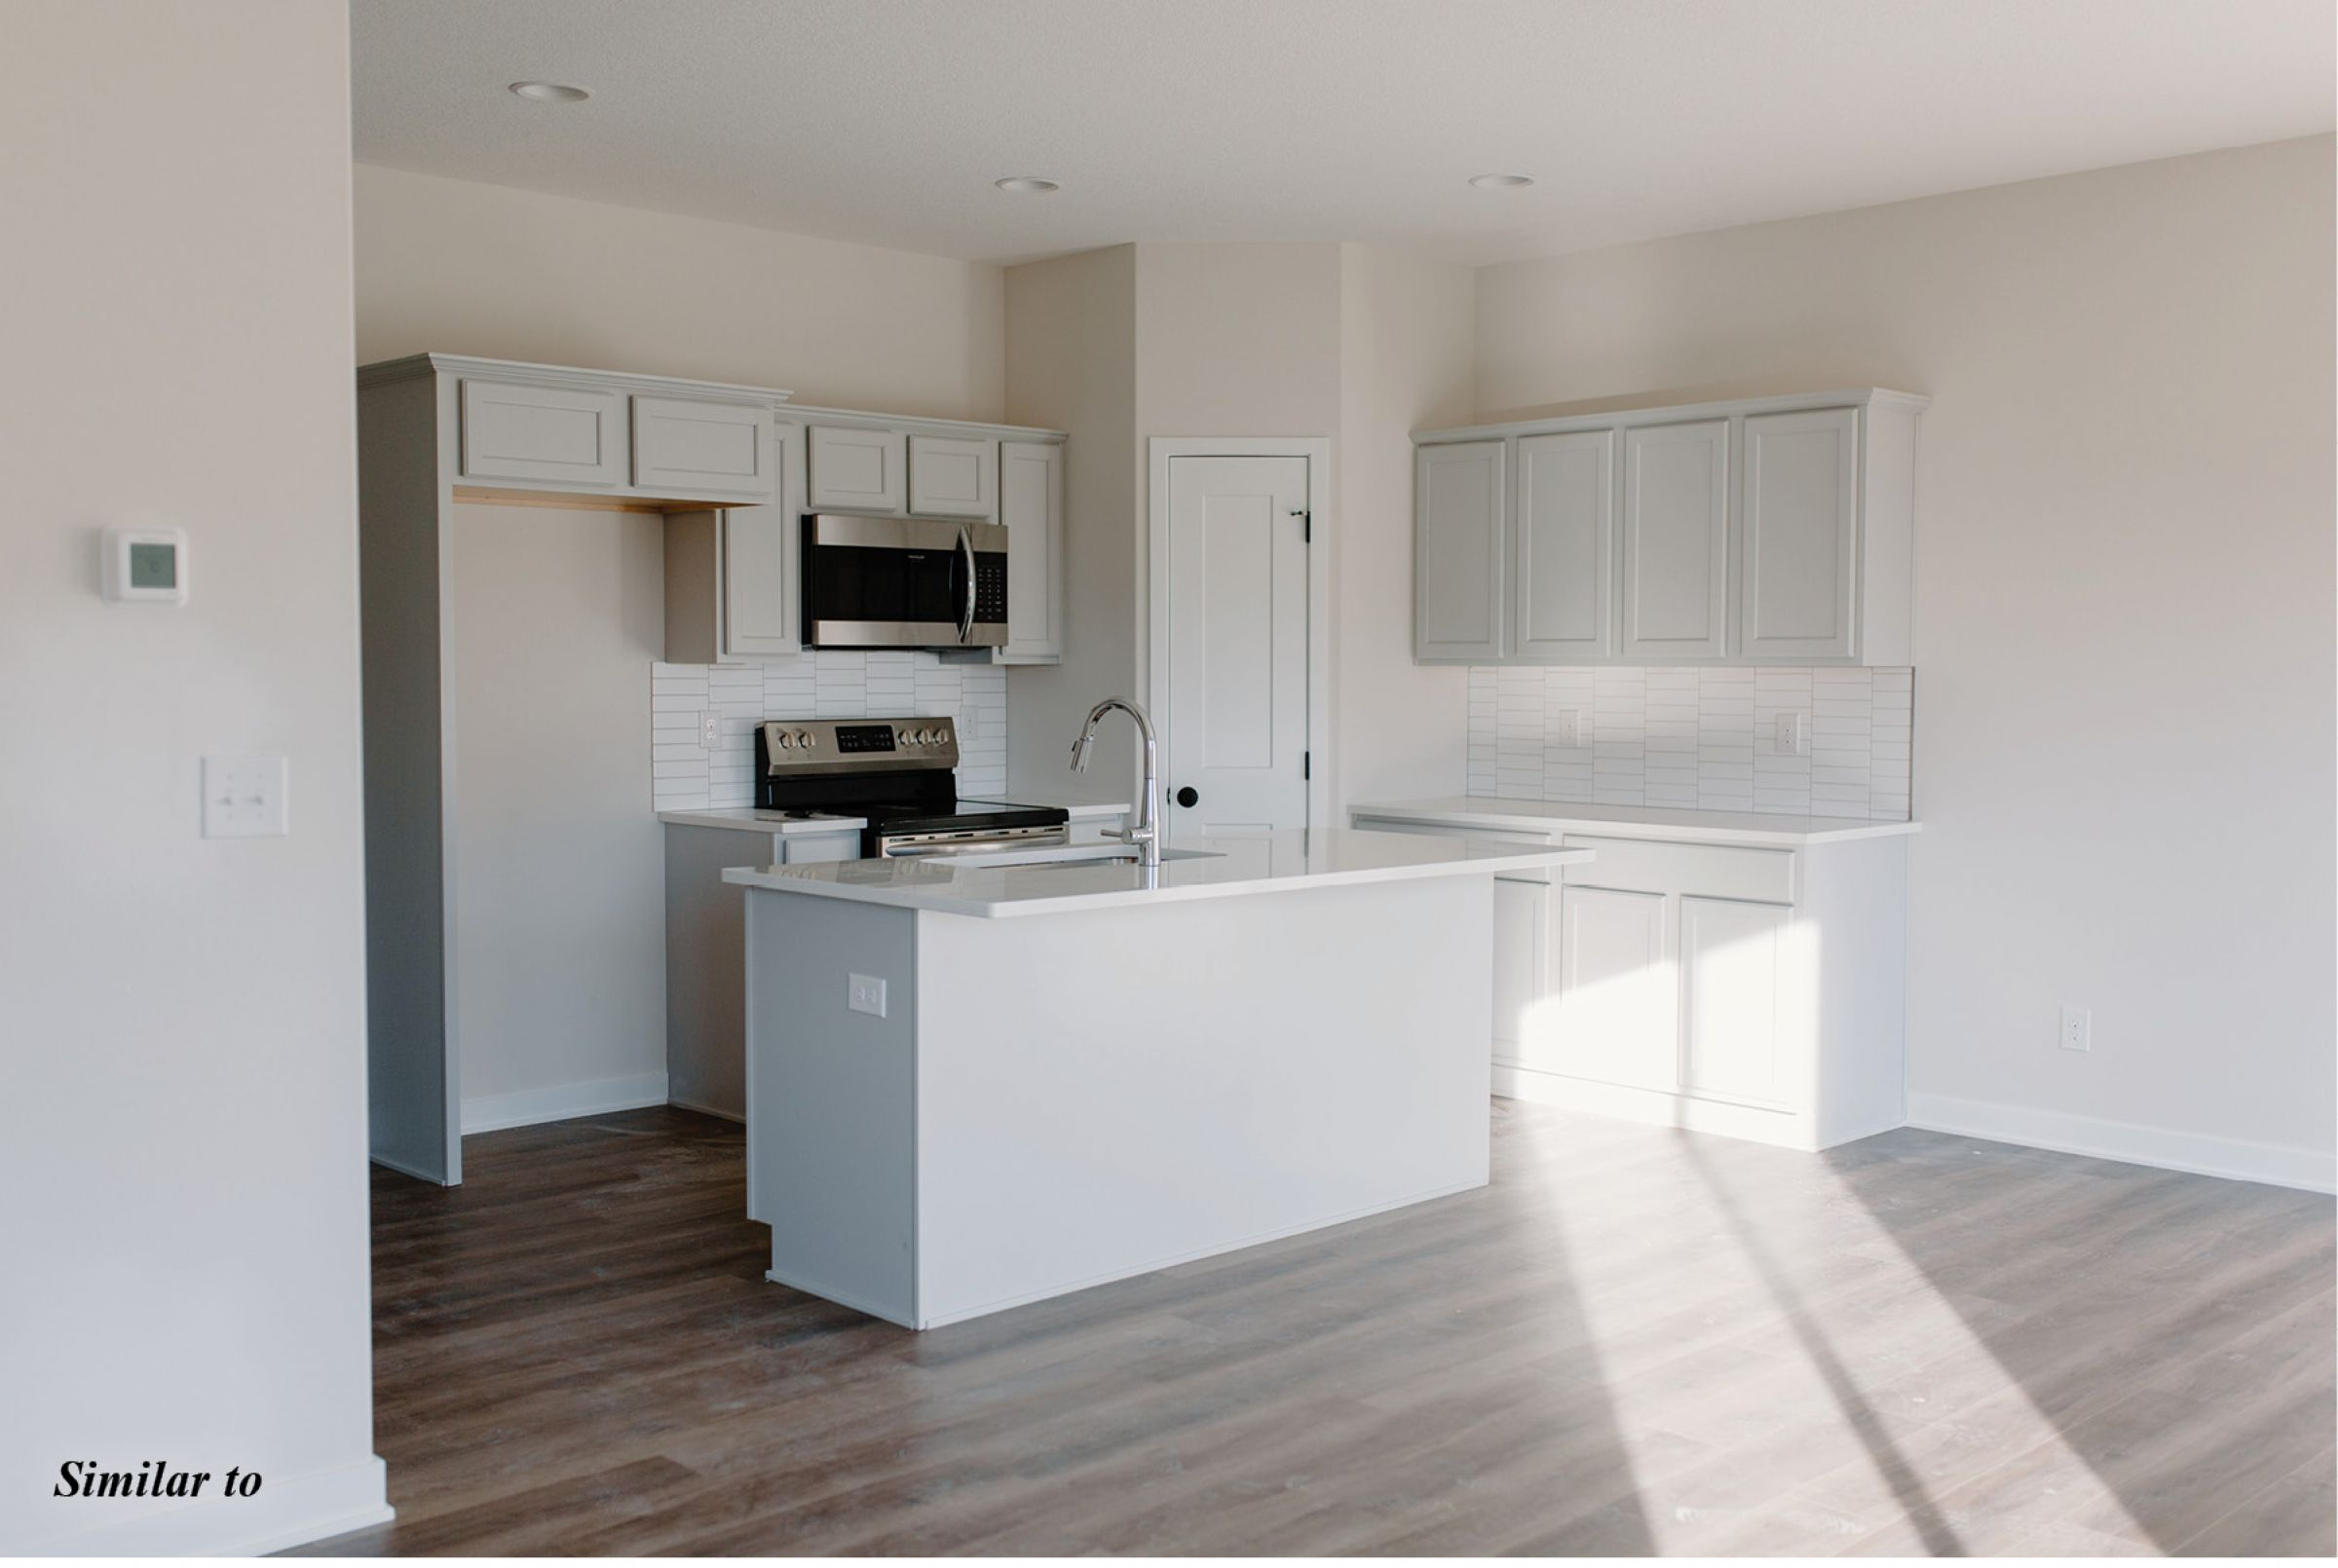 residential-warren-county-iowa-0-acres-listing-number-15675-1-2021-08-06-141913.jpg